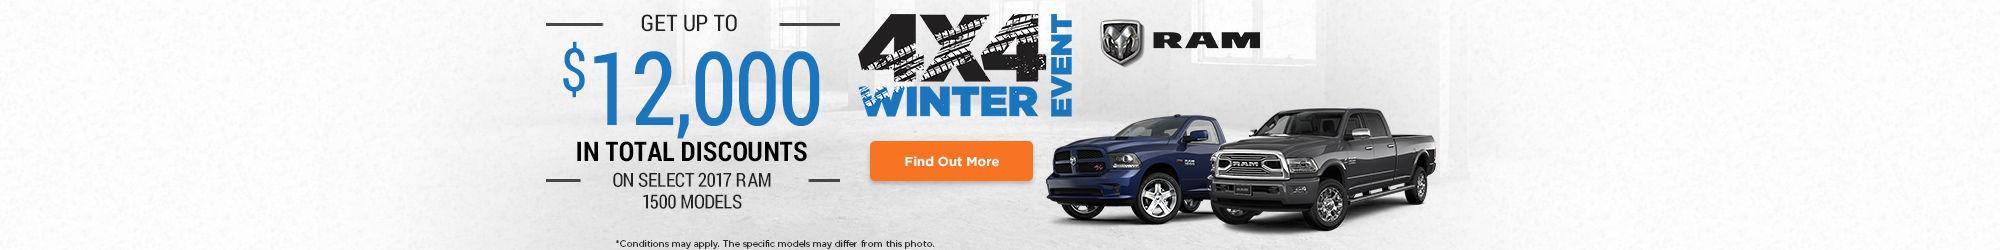 Winter 4x4 Event - RAM